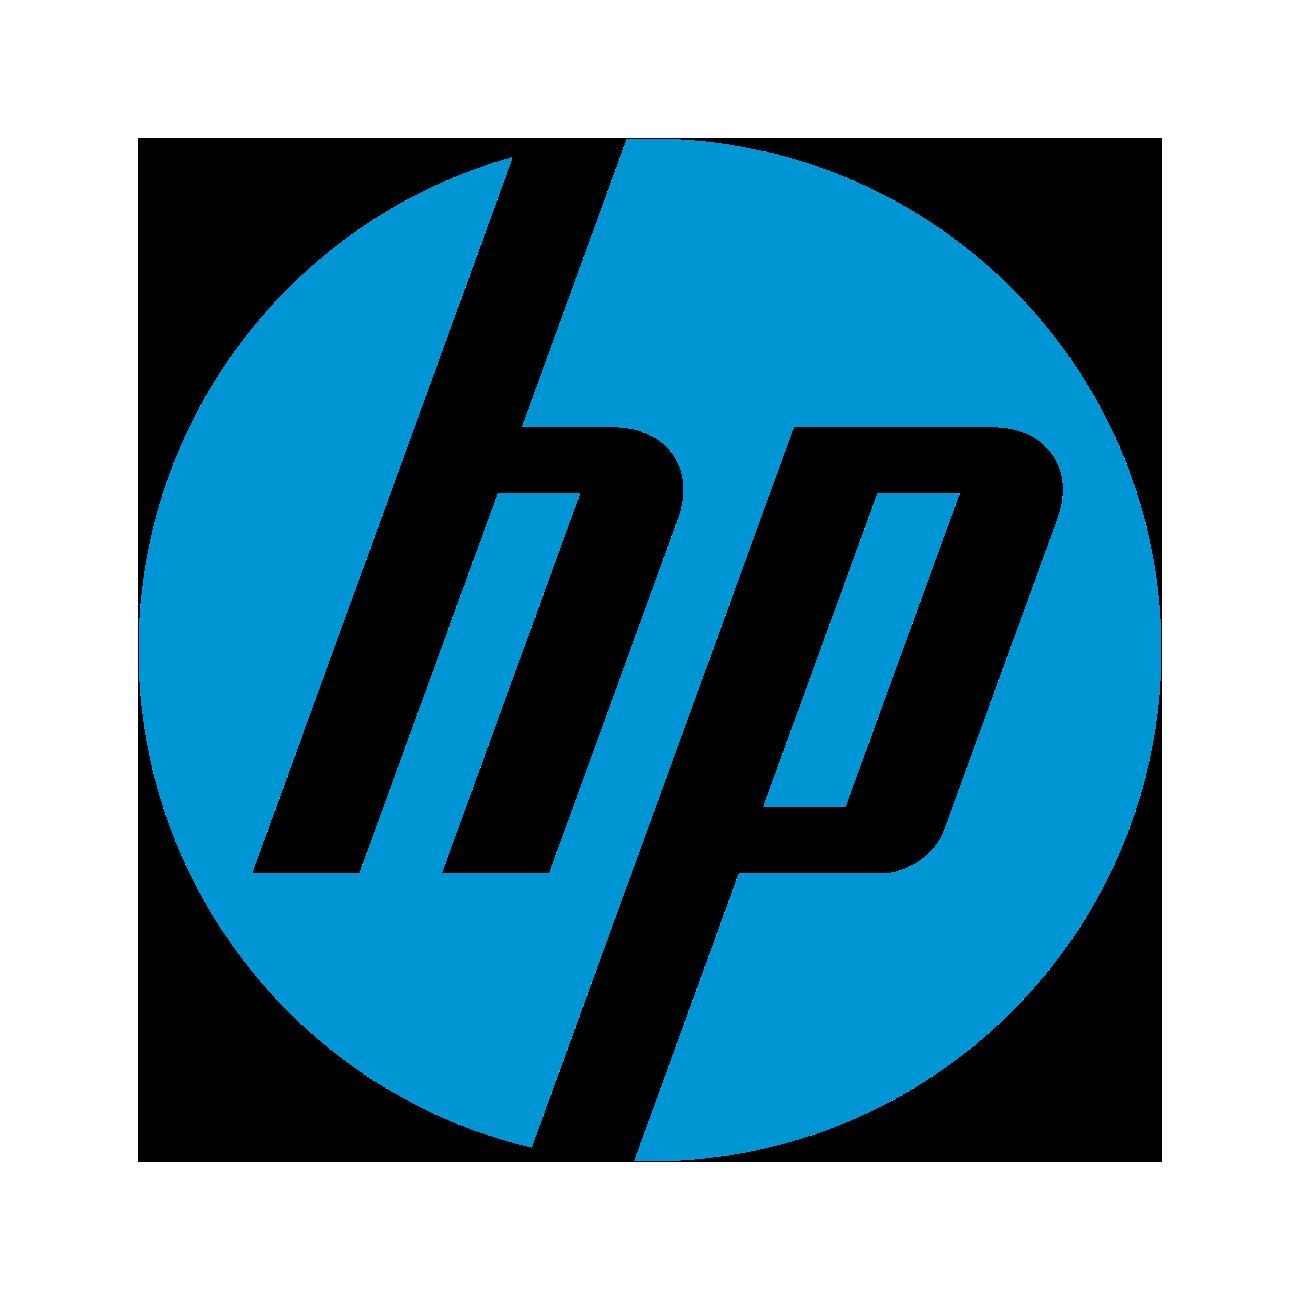 "HP ZBook Studio G7 39.6 cm (15.6"") Mobile Workstation - 4K UHD - 3840 x 2160 - Intel Core i9 (10th Gen) i9-10885H Octa-core (8 Core) 2.40 GHz - 32 GB RAM - 1 TB SSD"